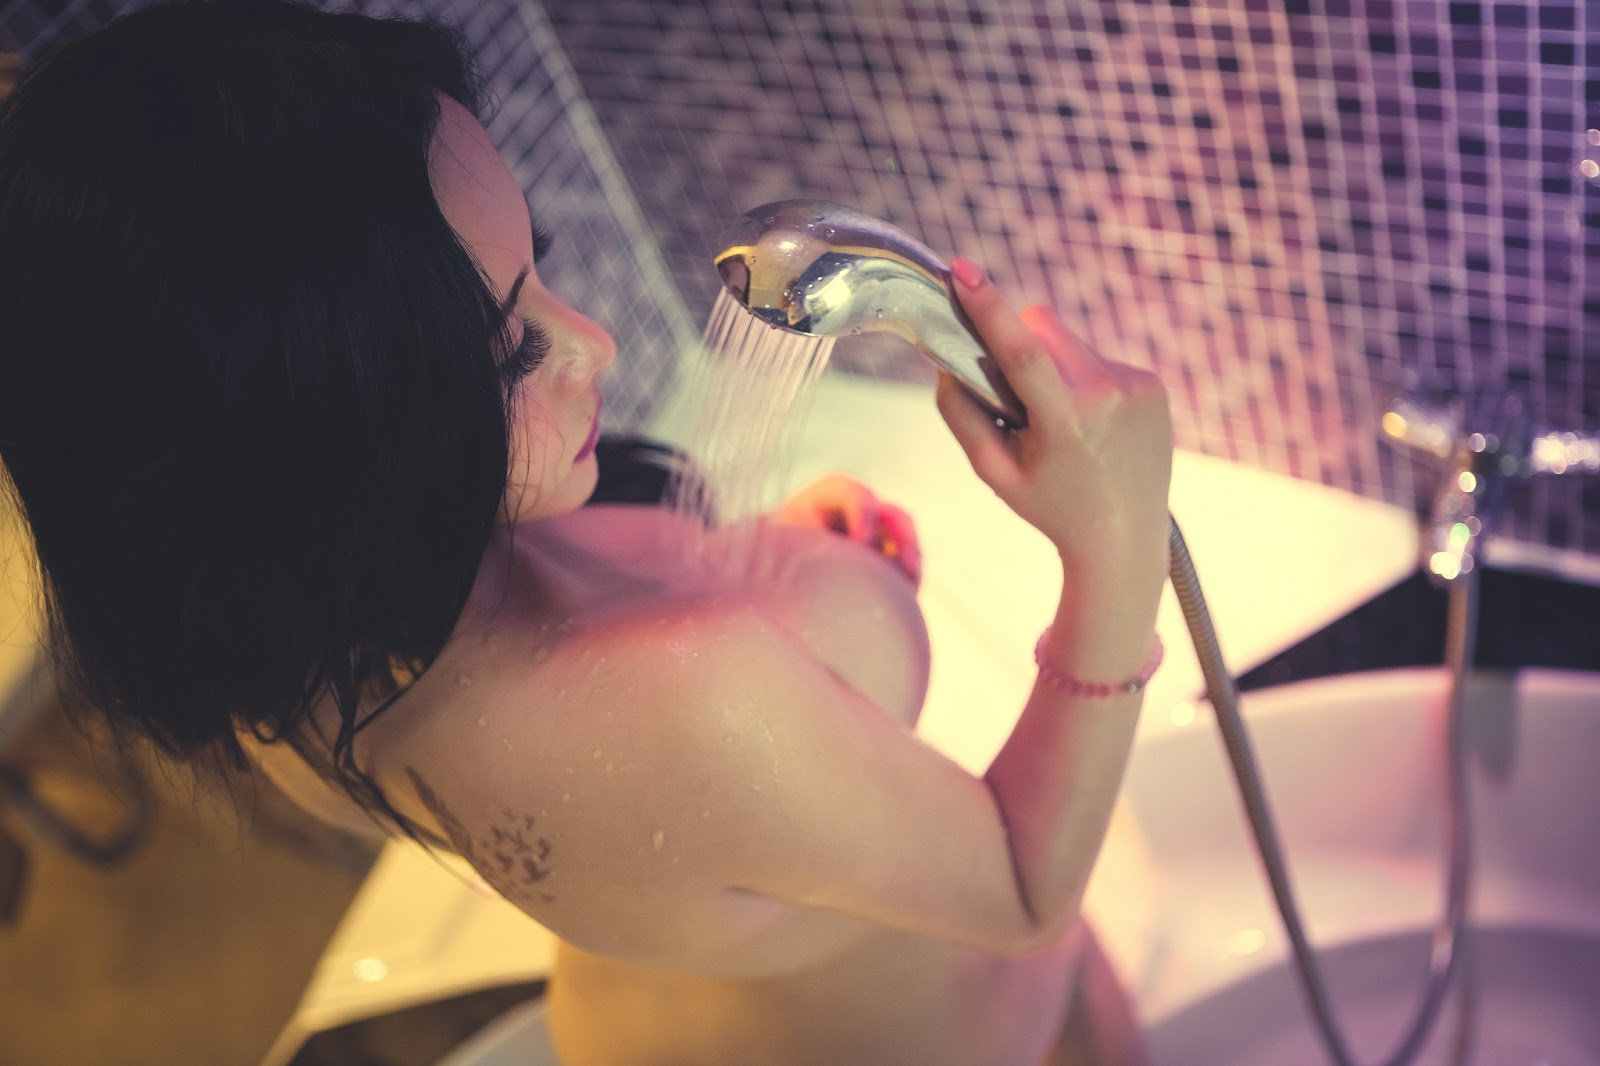 anh-nude-hot-girl-16.jpg